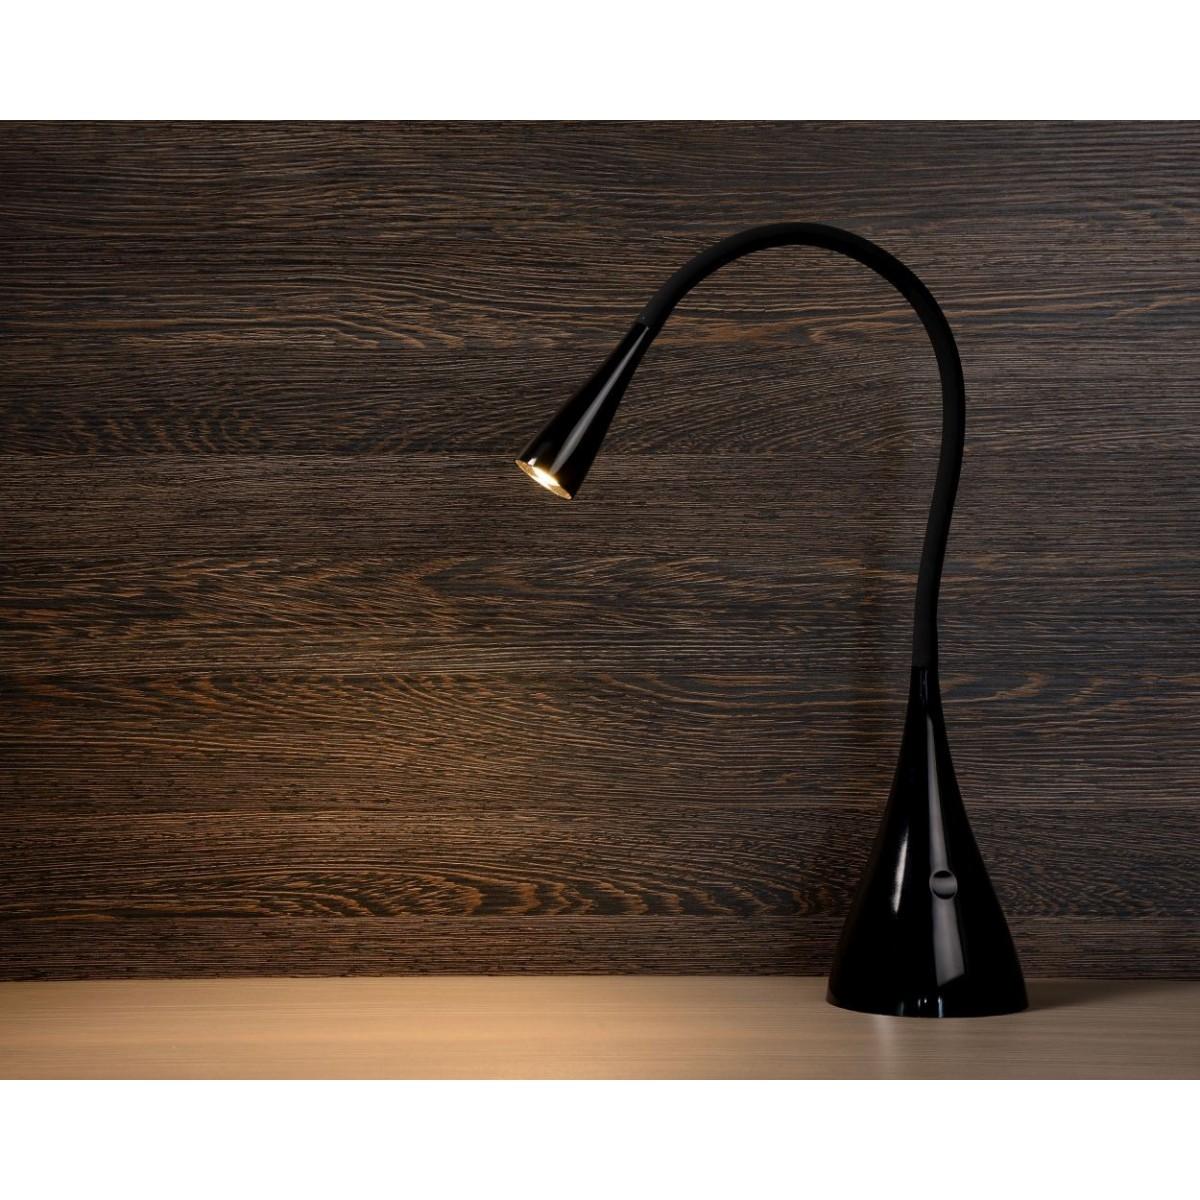 Lucide ZOZY Biurkowa LED 3W 3000K 300LM H48cm Black 18650/03/30